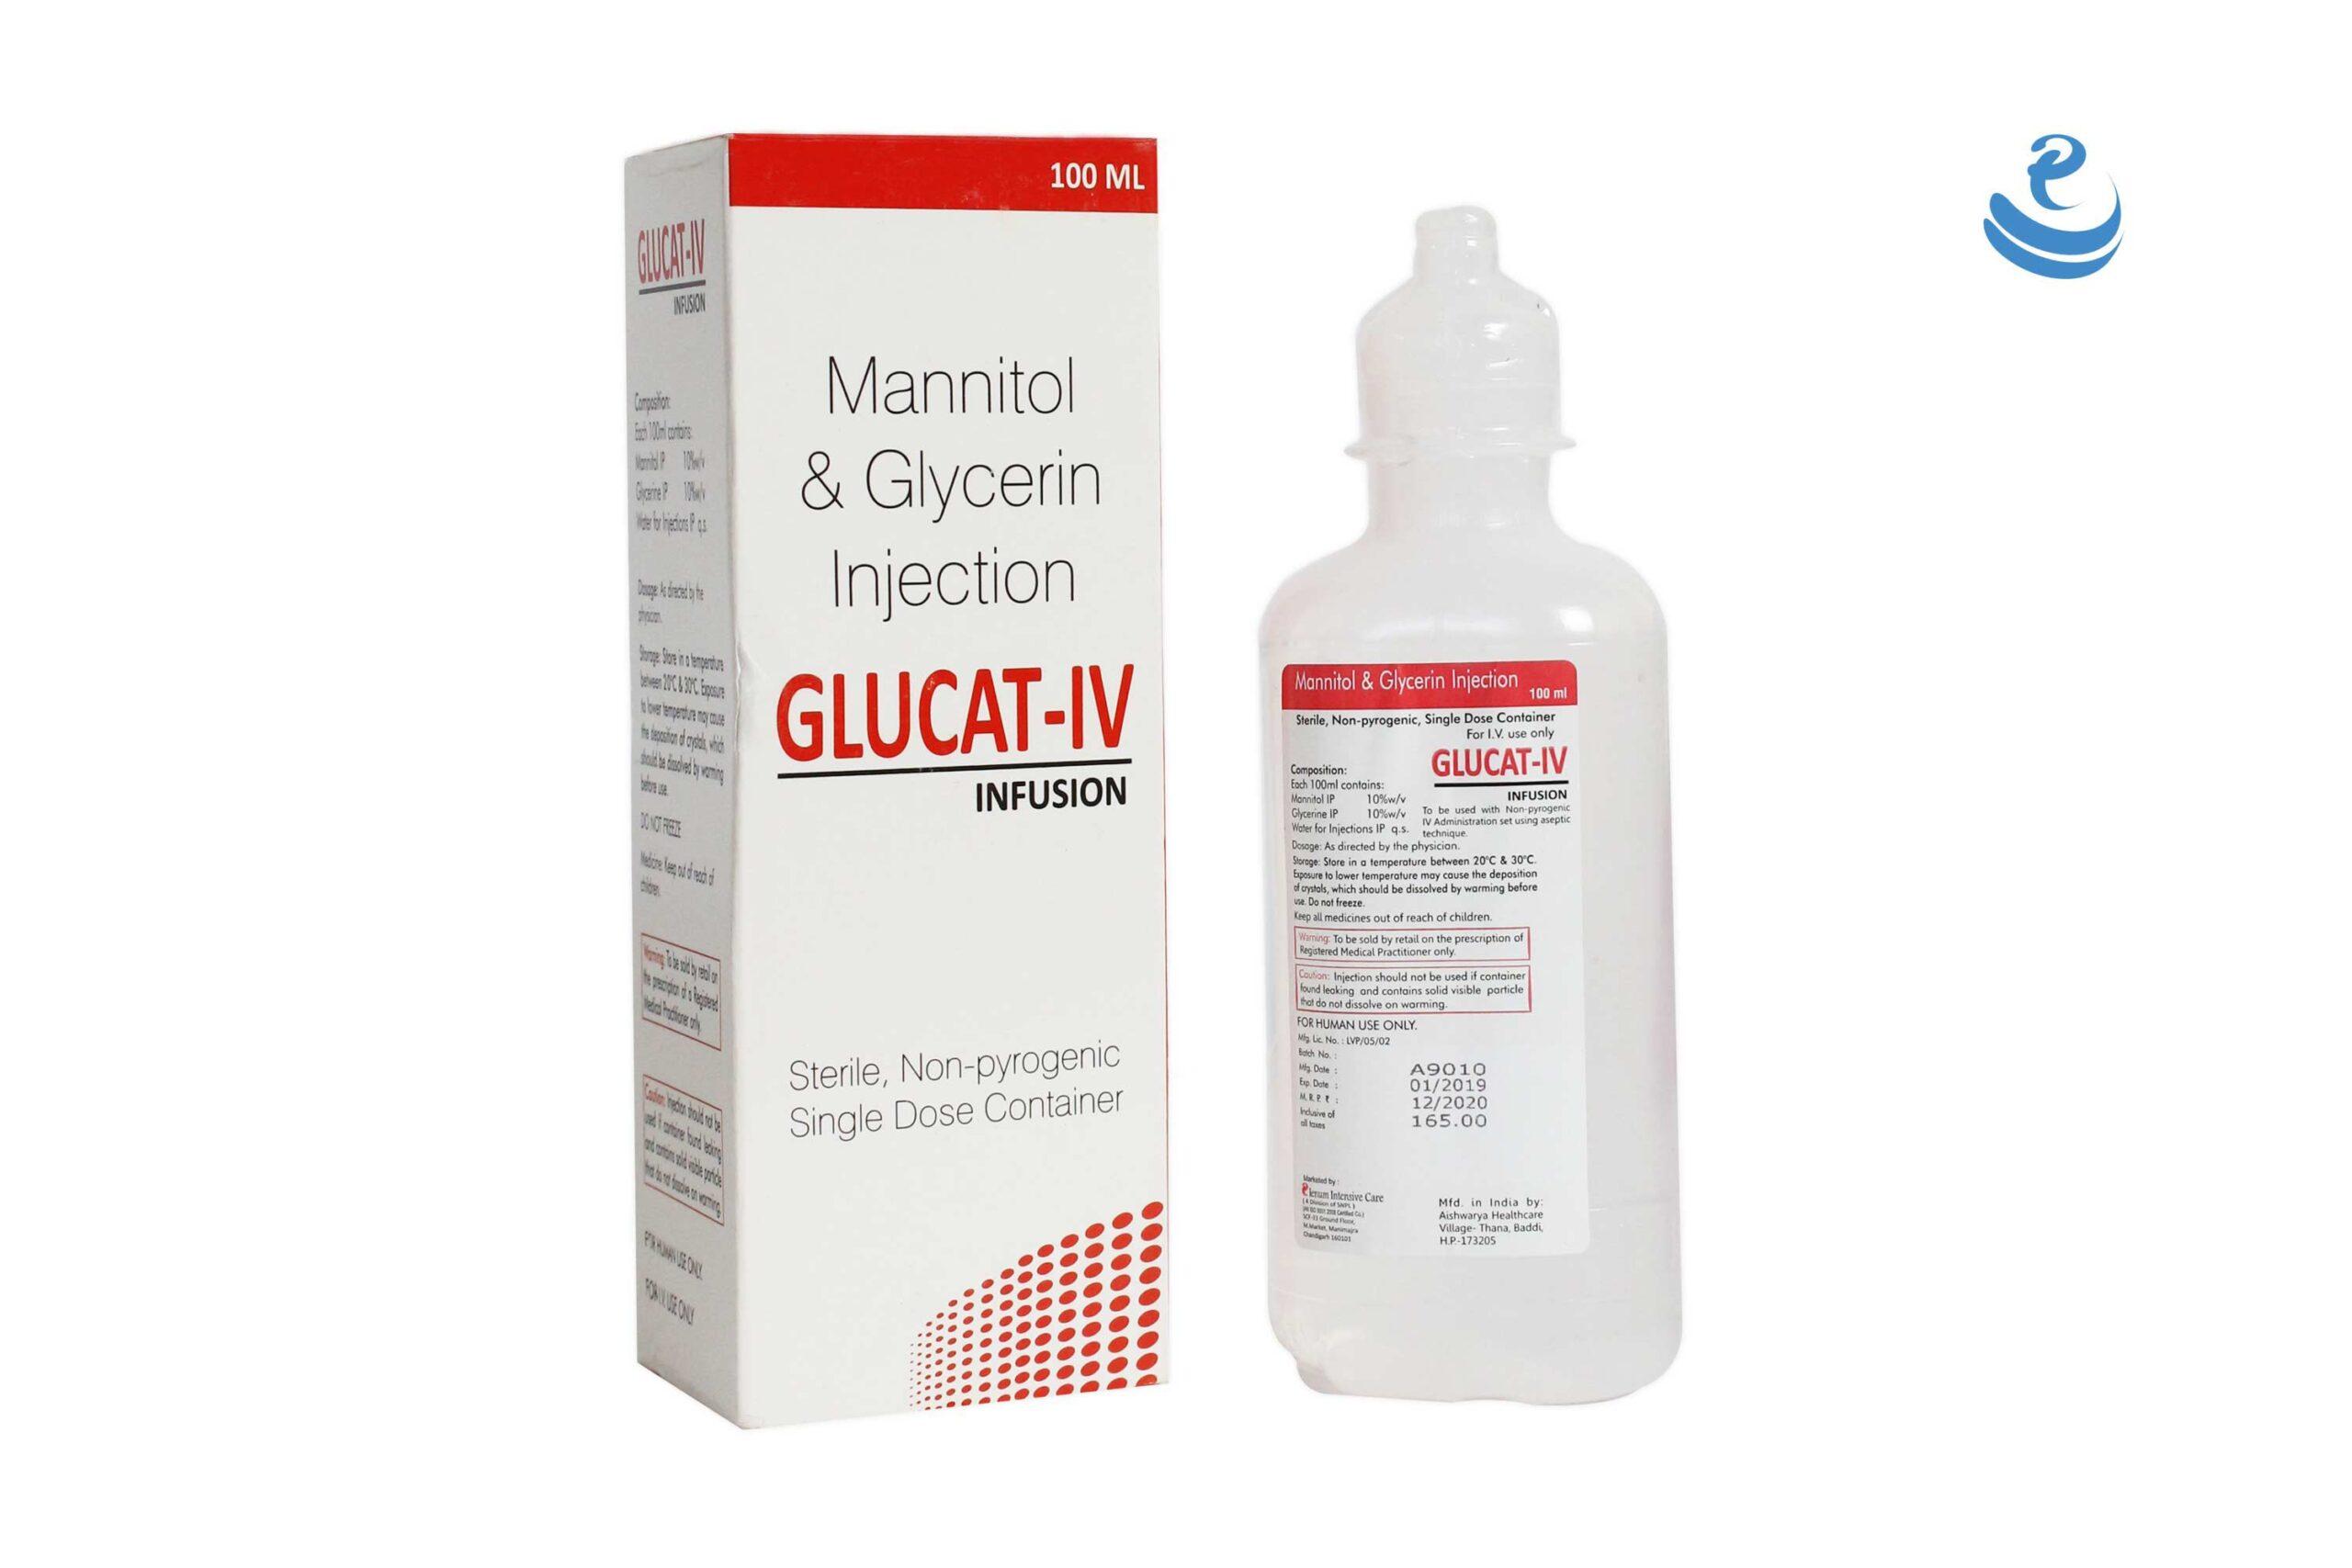 Glucat-IV